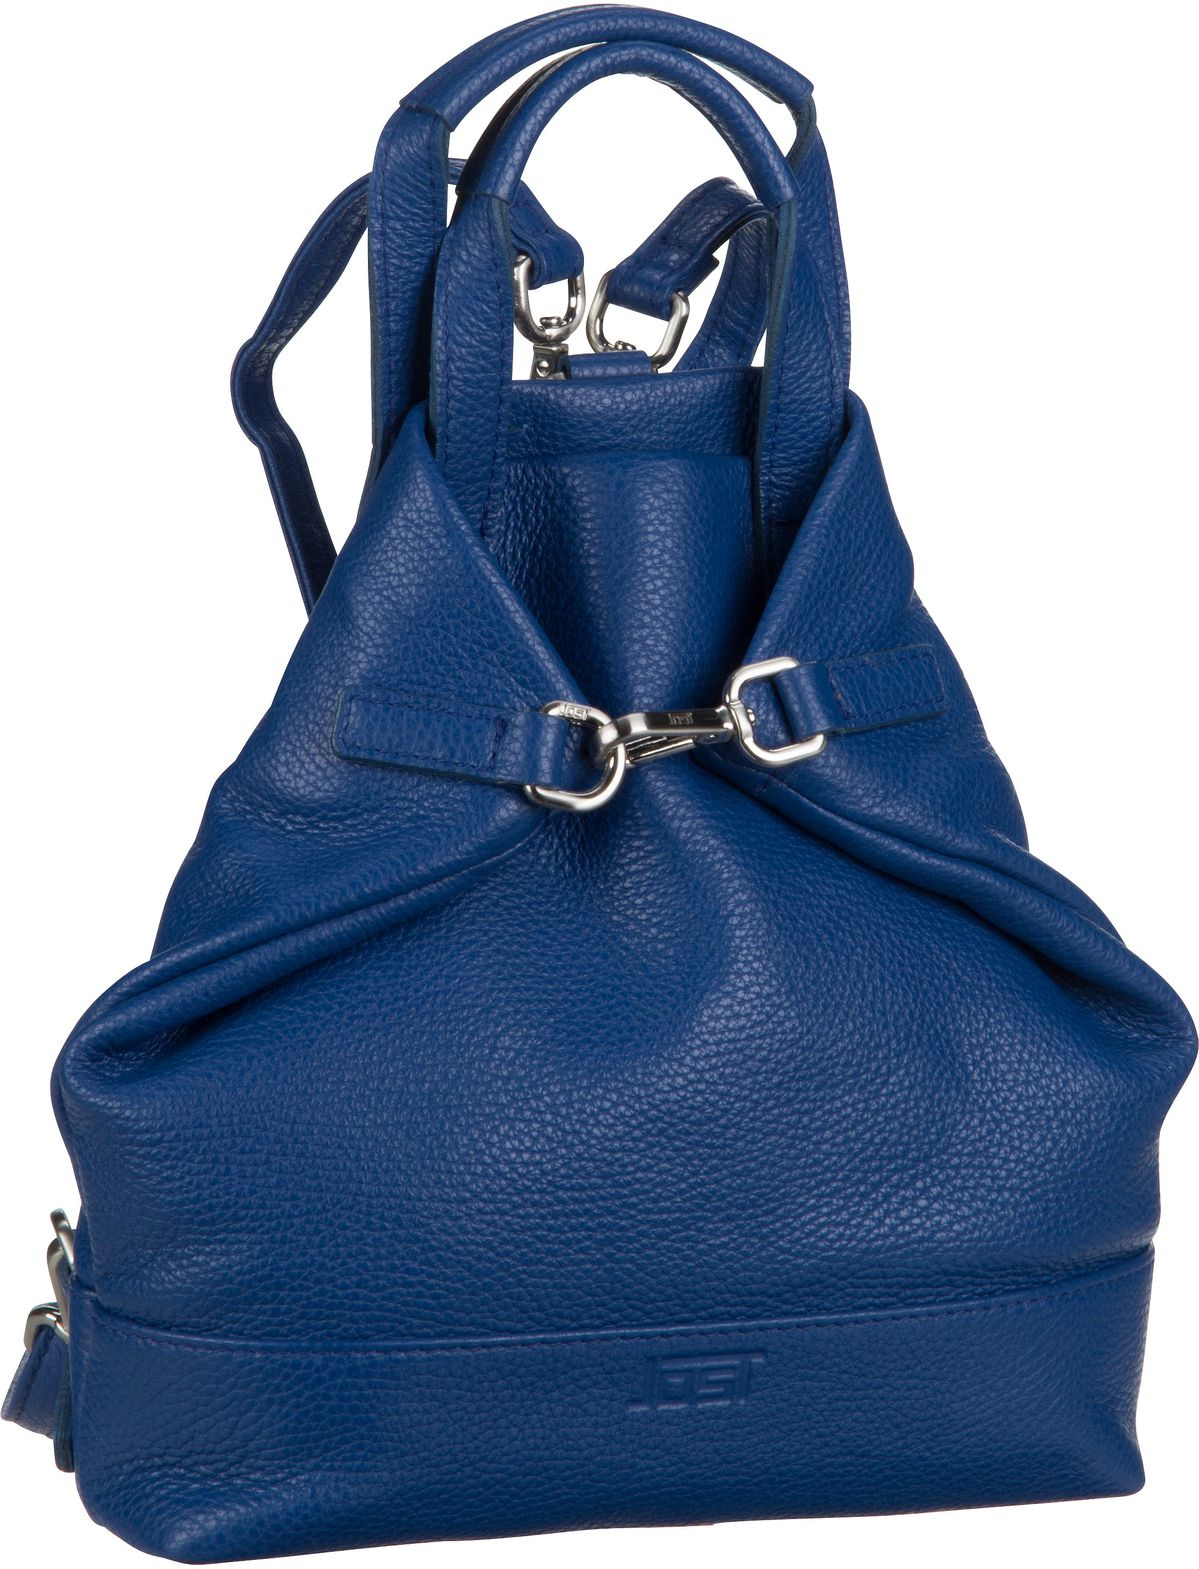 Rucksack / Daypack Vika 1840 X-Change Bag Mini Royalblue